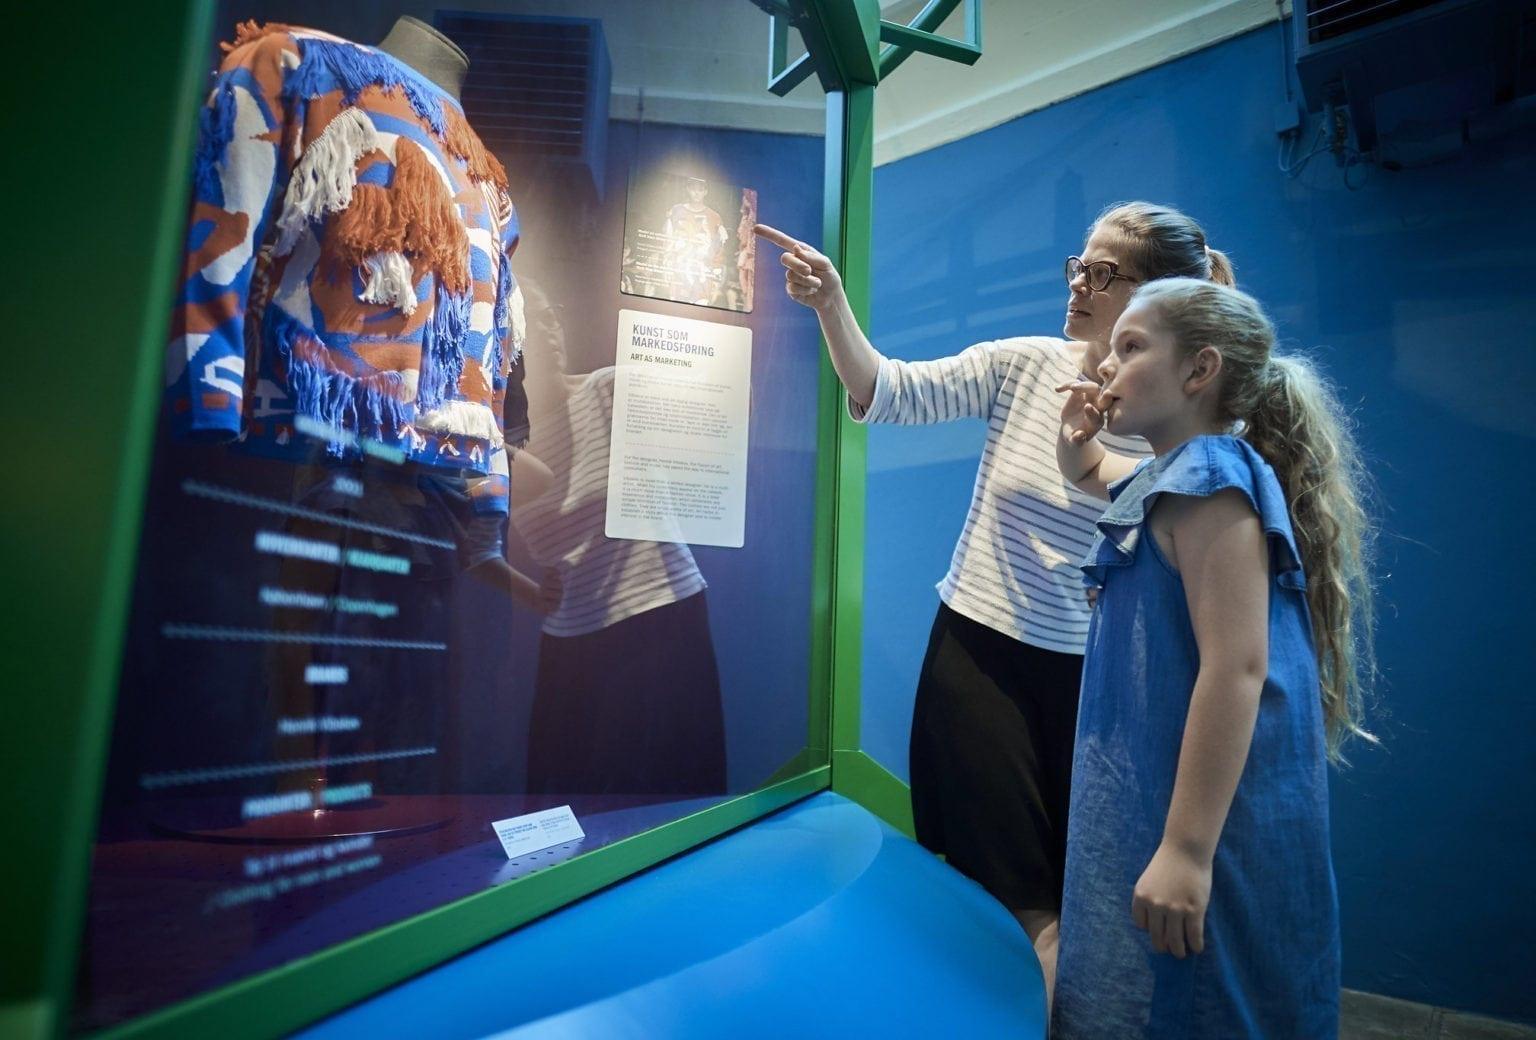 Udstillingen made in midtjylland på Tekstilmuseet i Herning